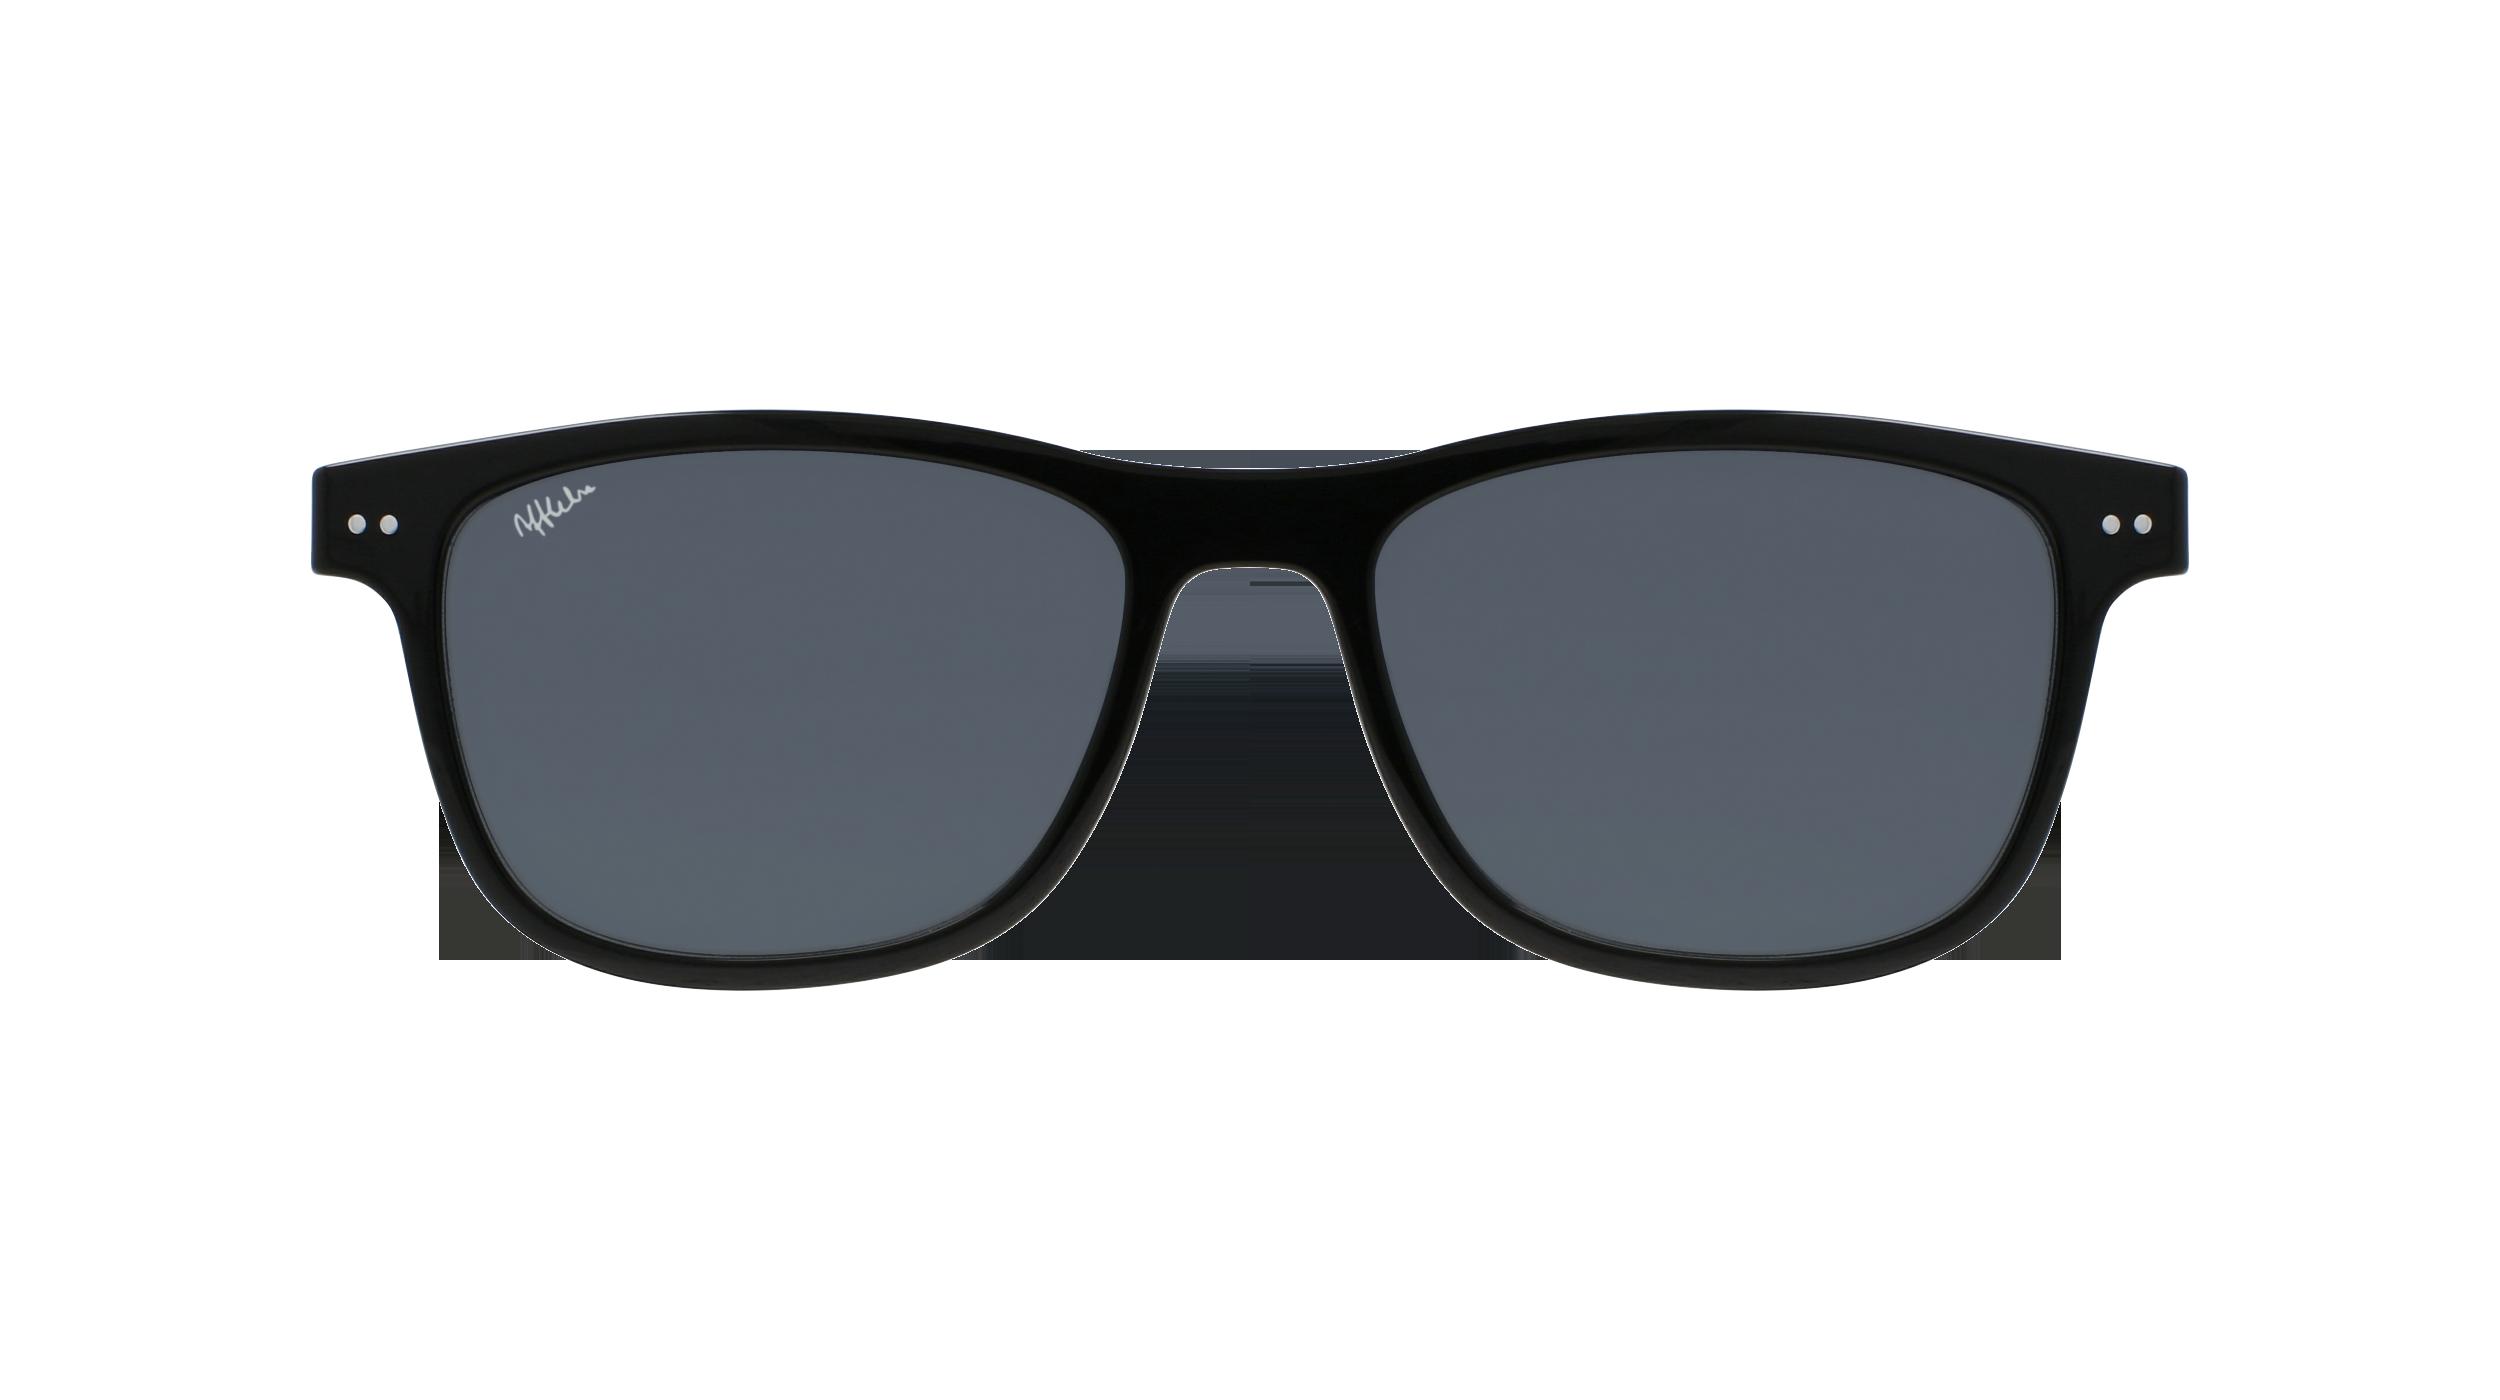 afflelou/france/products/smart_clip/clips_glasses/07630036436035.png